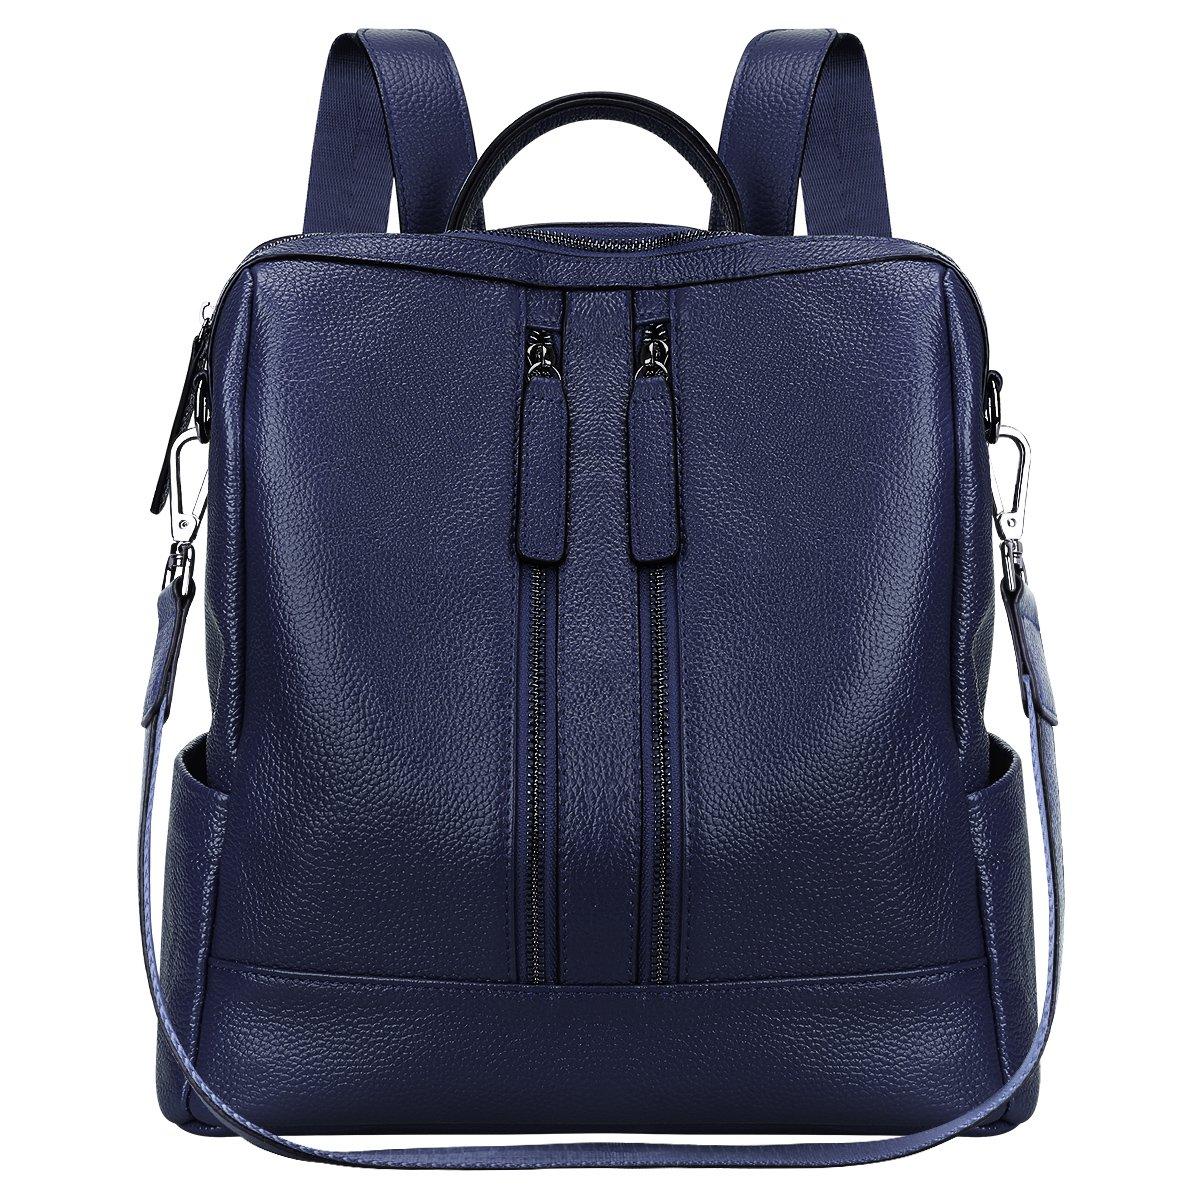 S-ZONE Women Genuine Leather Backpack Casual Shoulder Bag Purse Medium (Blue)